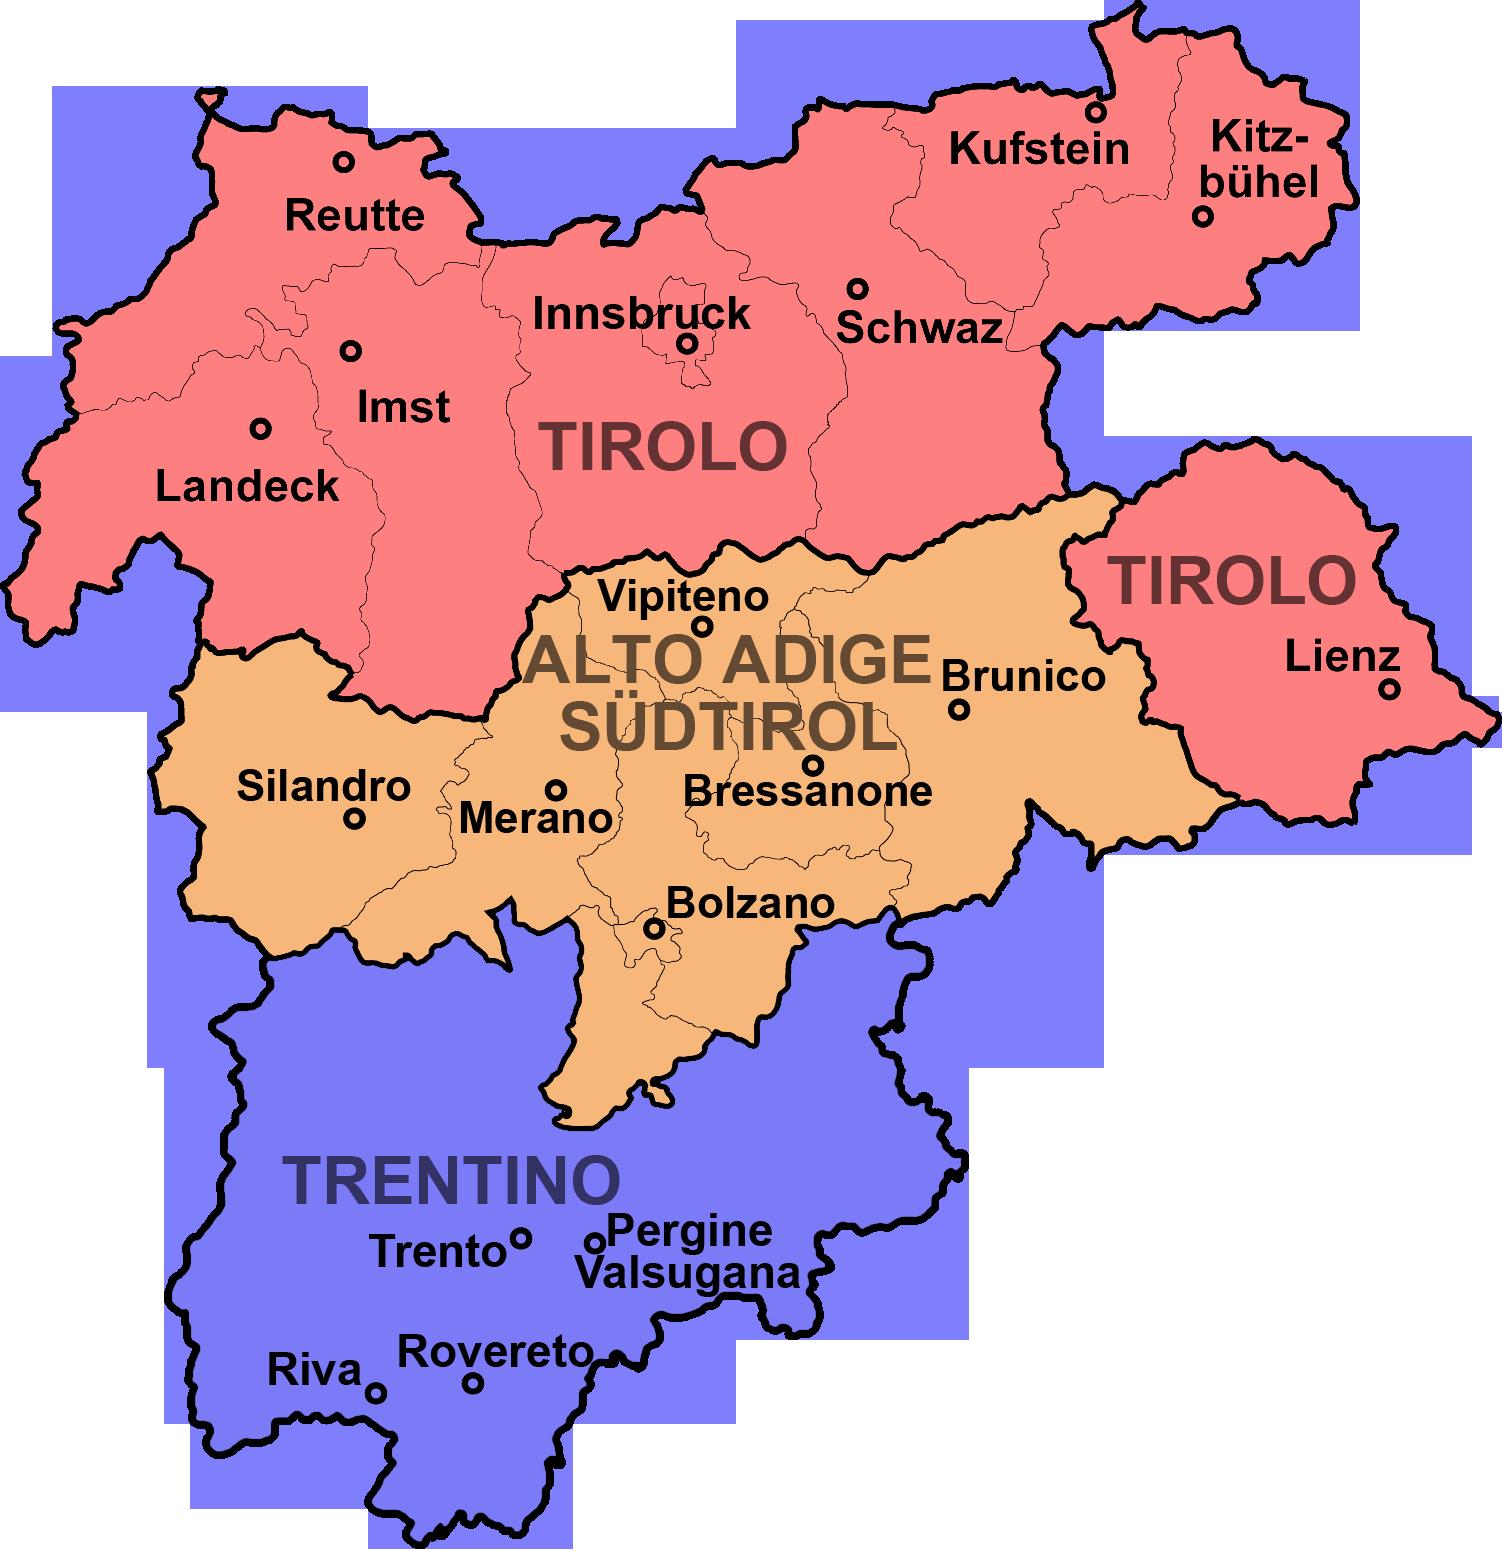 Tirolo-Südtirol-Trentino